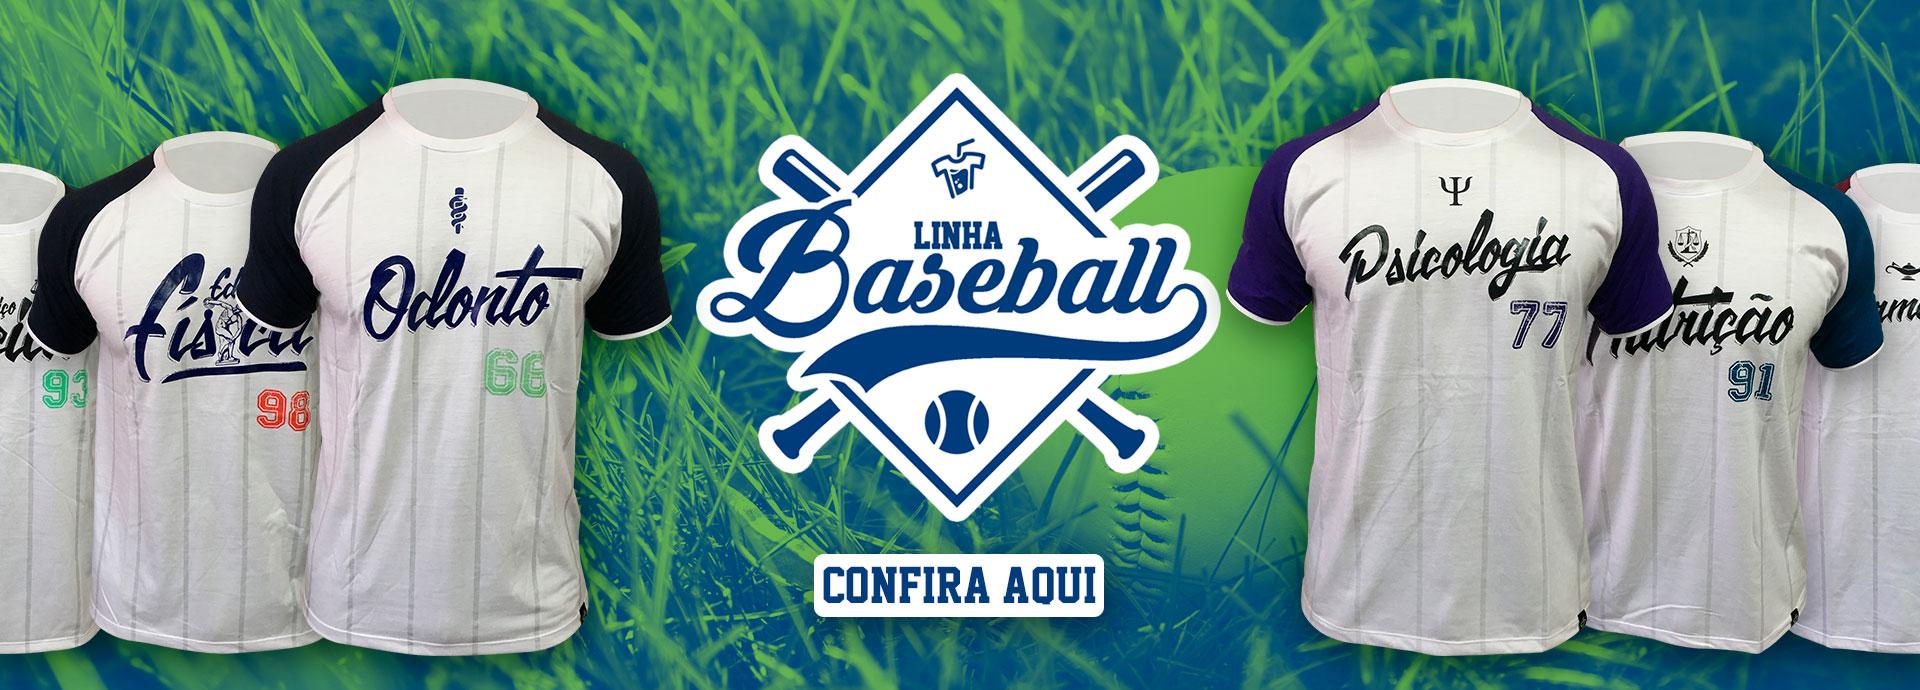 Banner Linha Baseball